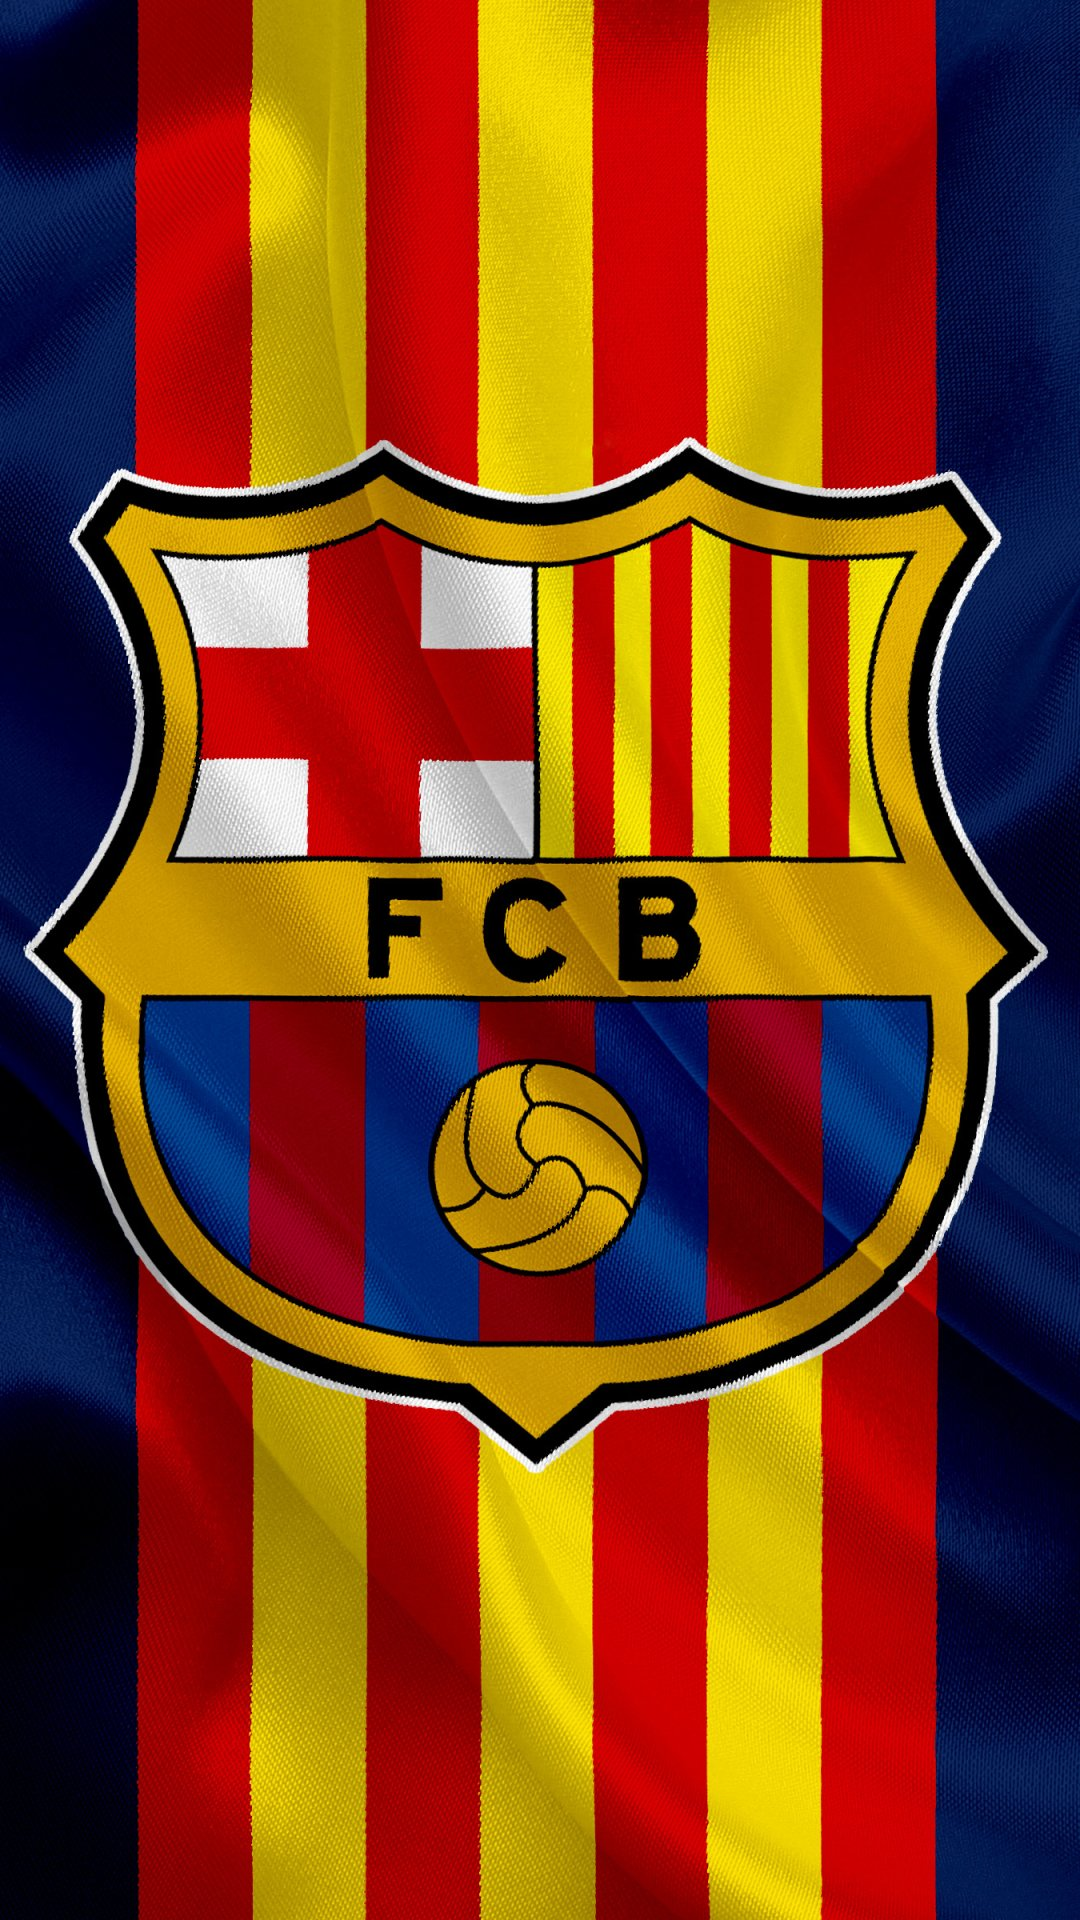 download FC Barcelona Wallpaper 10801920 02639 HD Wallpapers 1080x1920